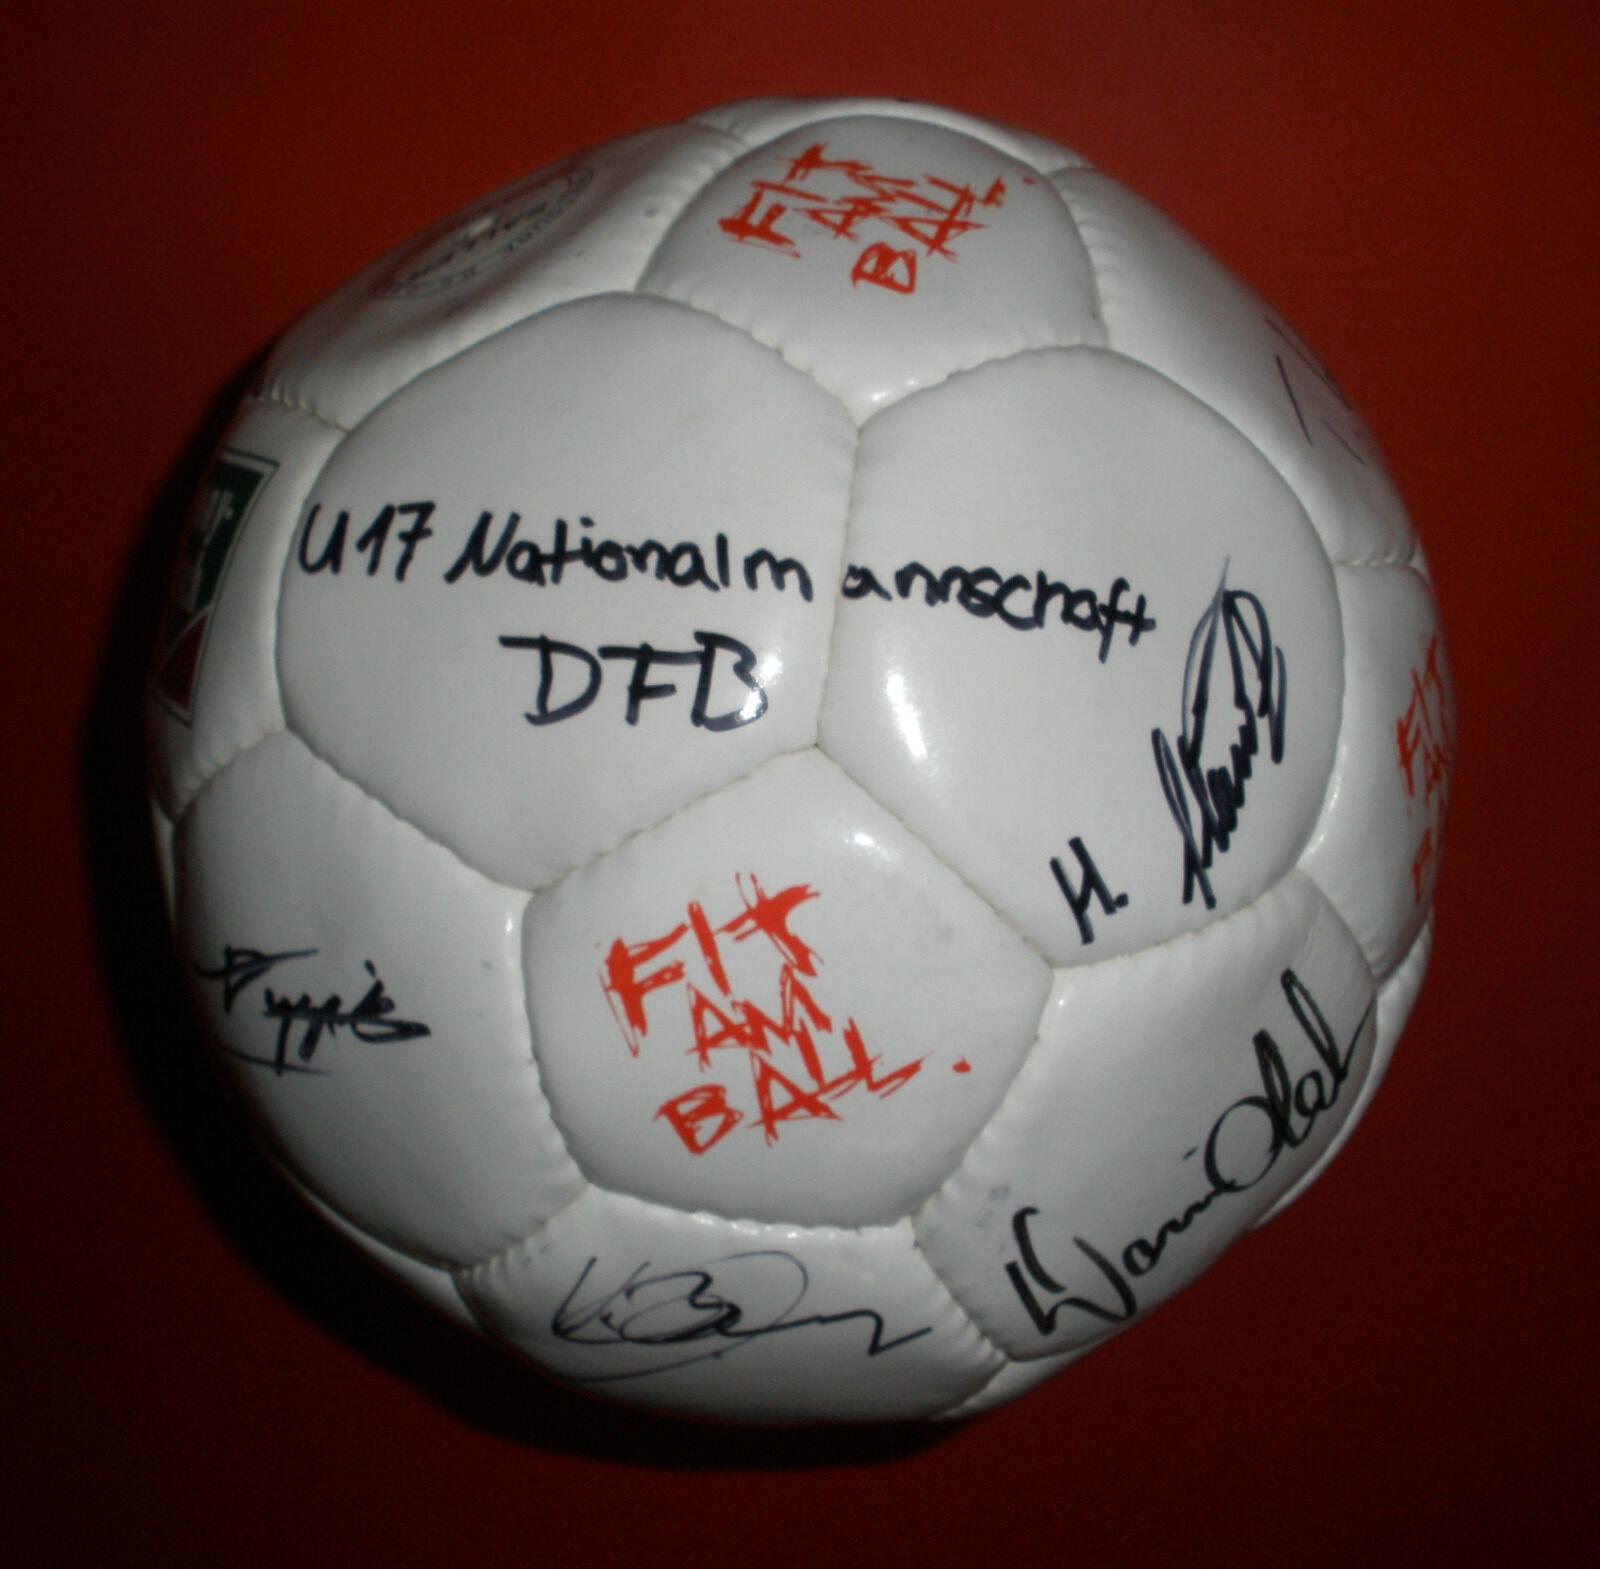 Deutschland Autogrammball Unterschriftenball DFB U17 EM-Qualifikation Toni Kroos